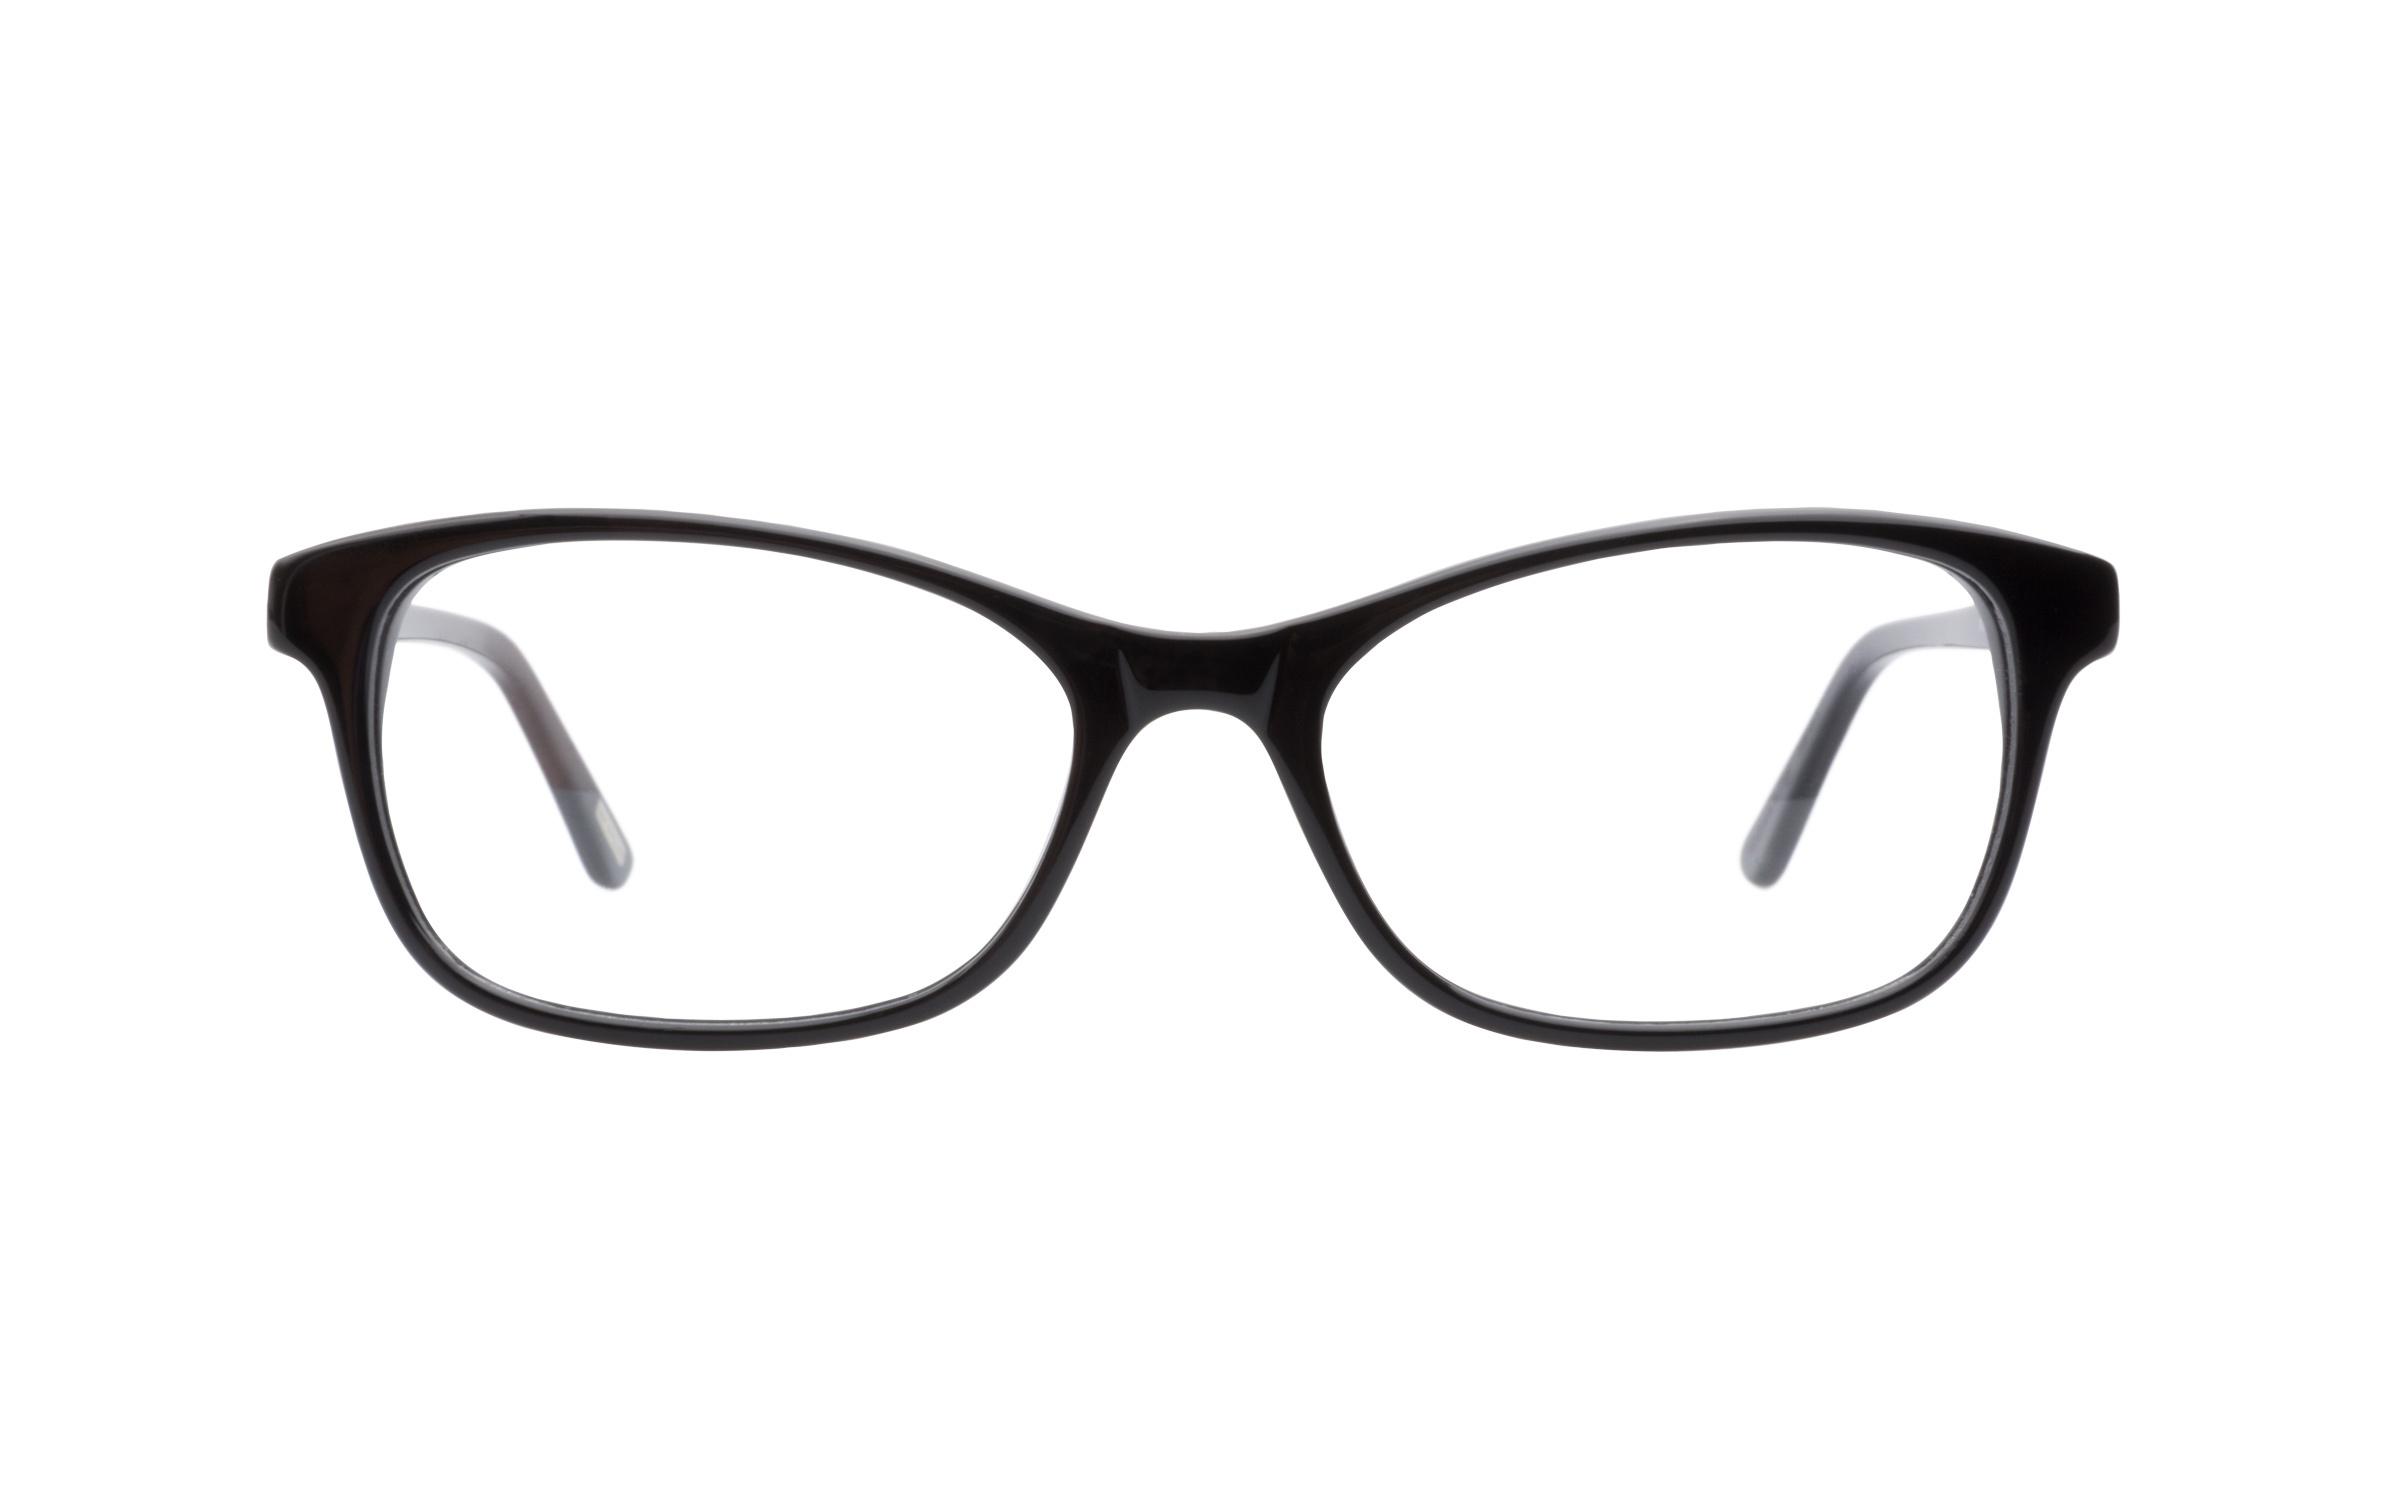 Kam_Dhillon_Womens_Glasses_Rectangular_Black_Acetate_Online_Coastal